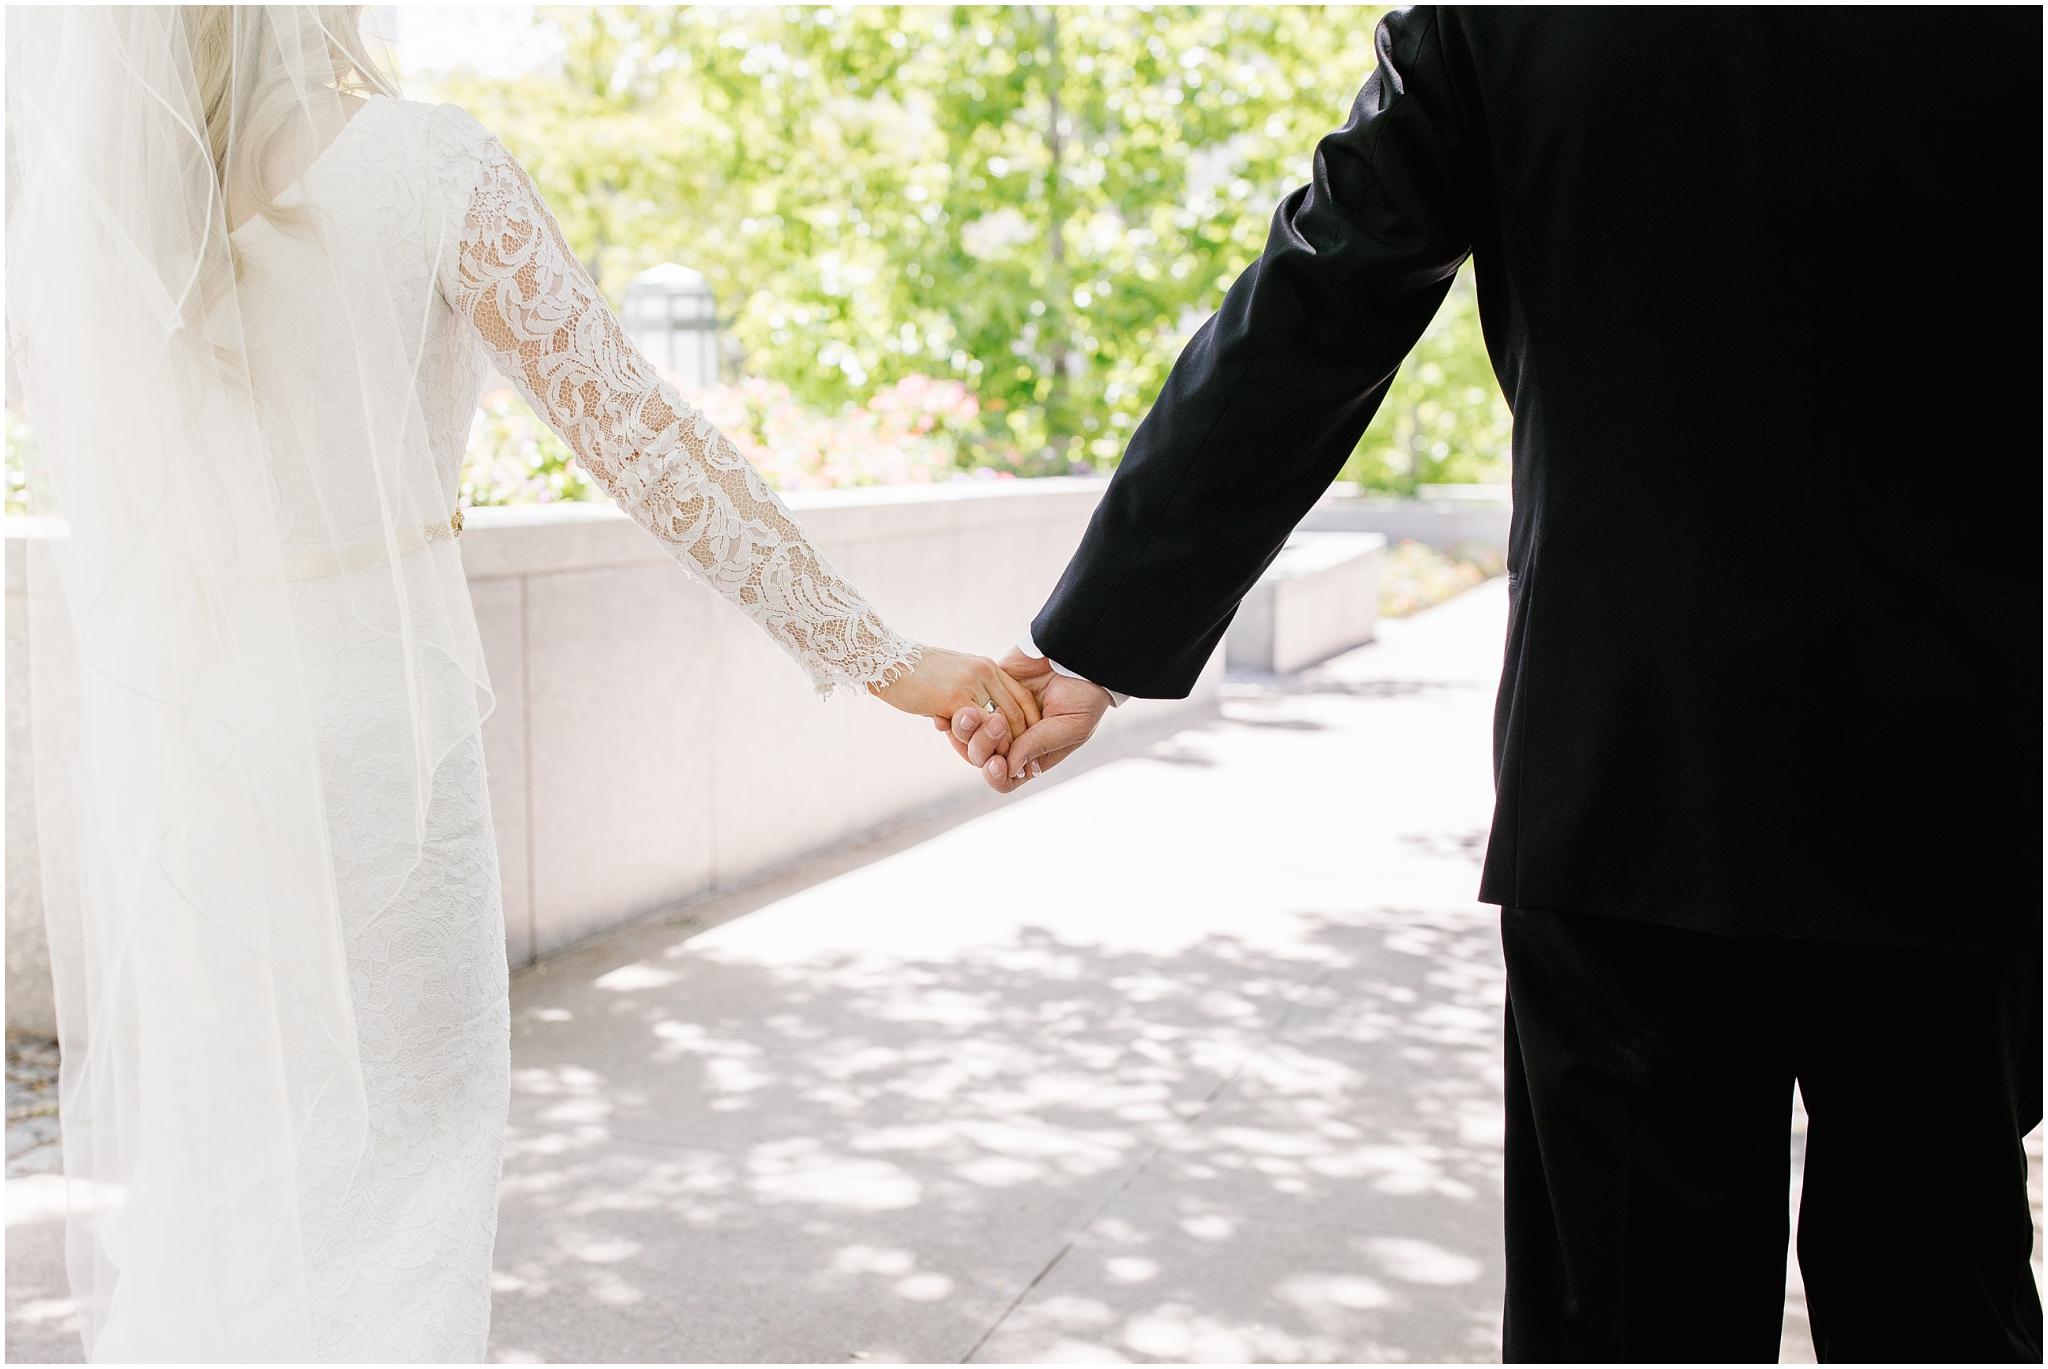 CherylandTyler-328_Lizzie-B-Imagery-Utah-Wedding-Photographer-Salt-Lake-City-Temple-Wells-Fargo-Building-Reception.jpg